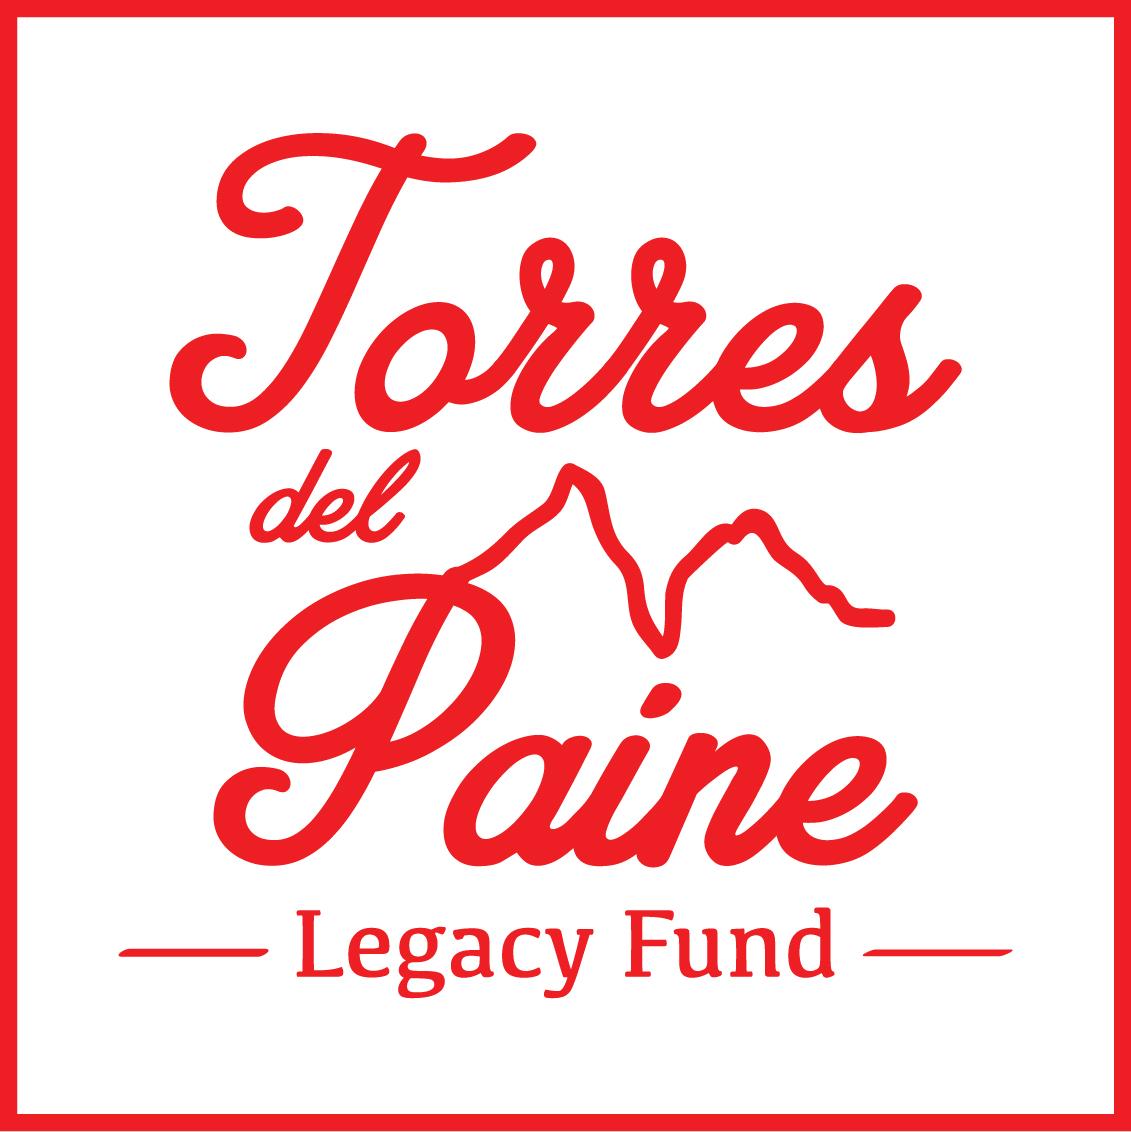 Legacyfund